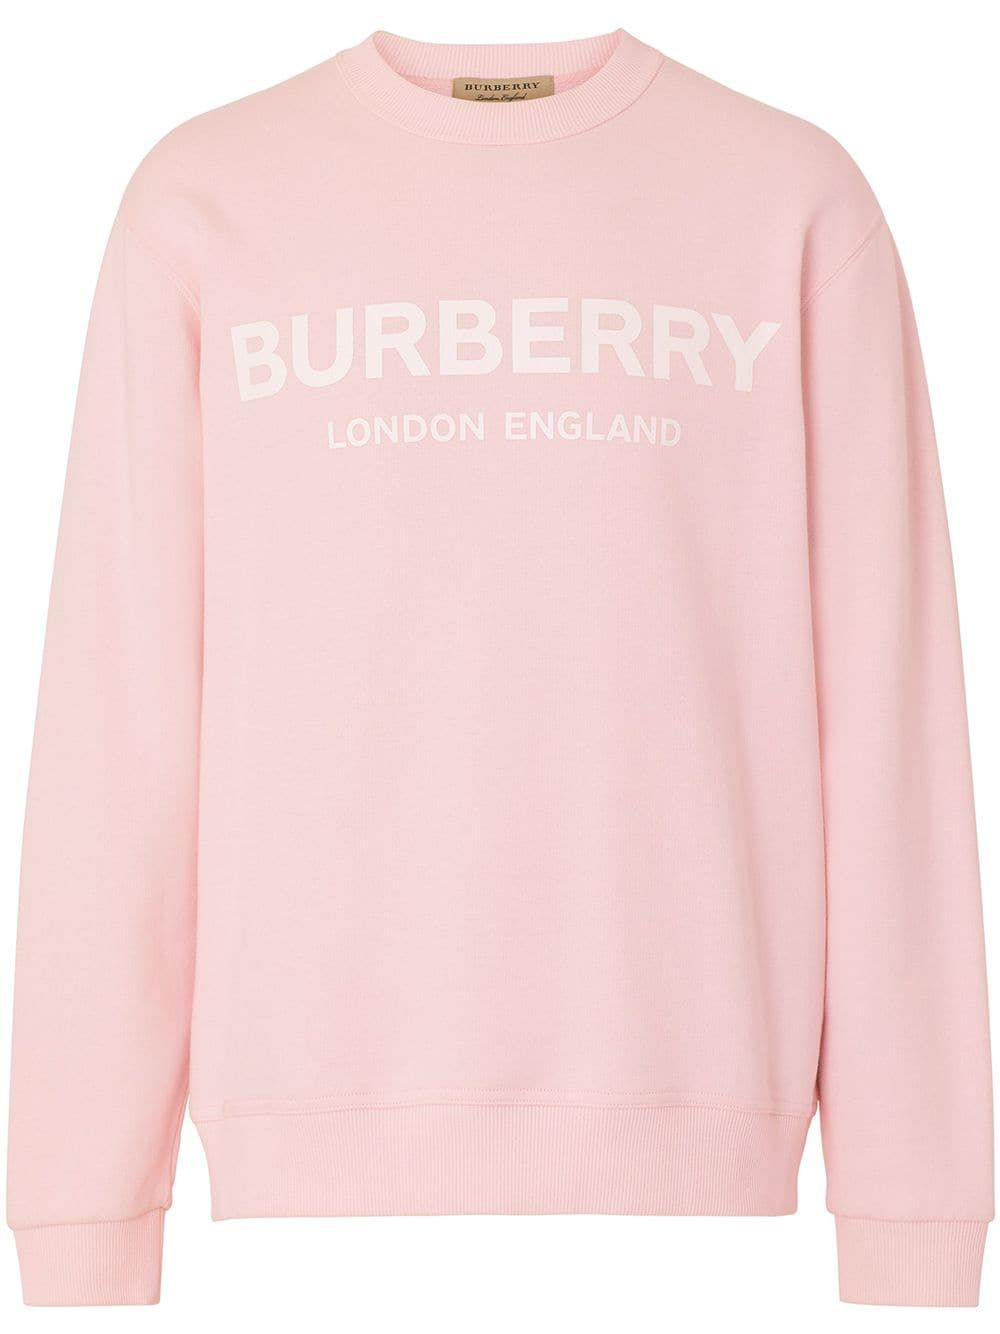 Burberry Logo Print Cotton Sweatshirt In Pink Modesens Gaya Model Pakaian Gaya Pakaian Wanita [ 1334 x 1000 Pixel ]